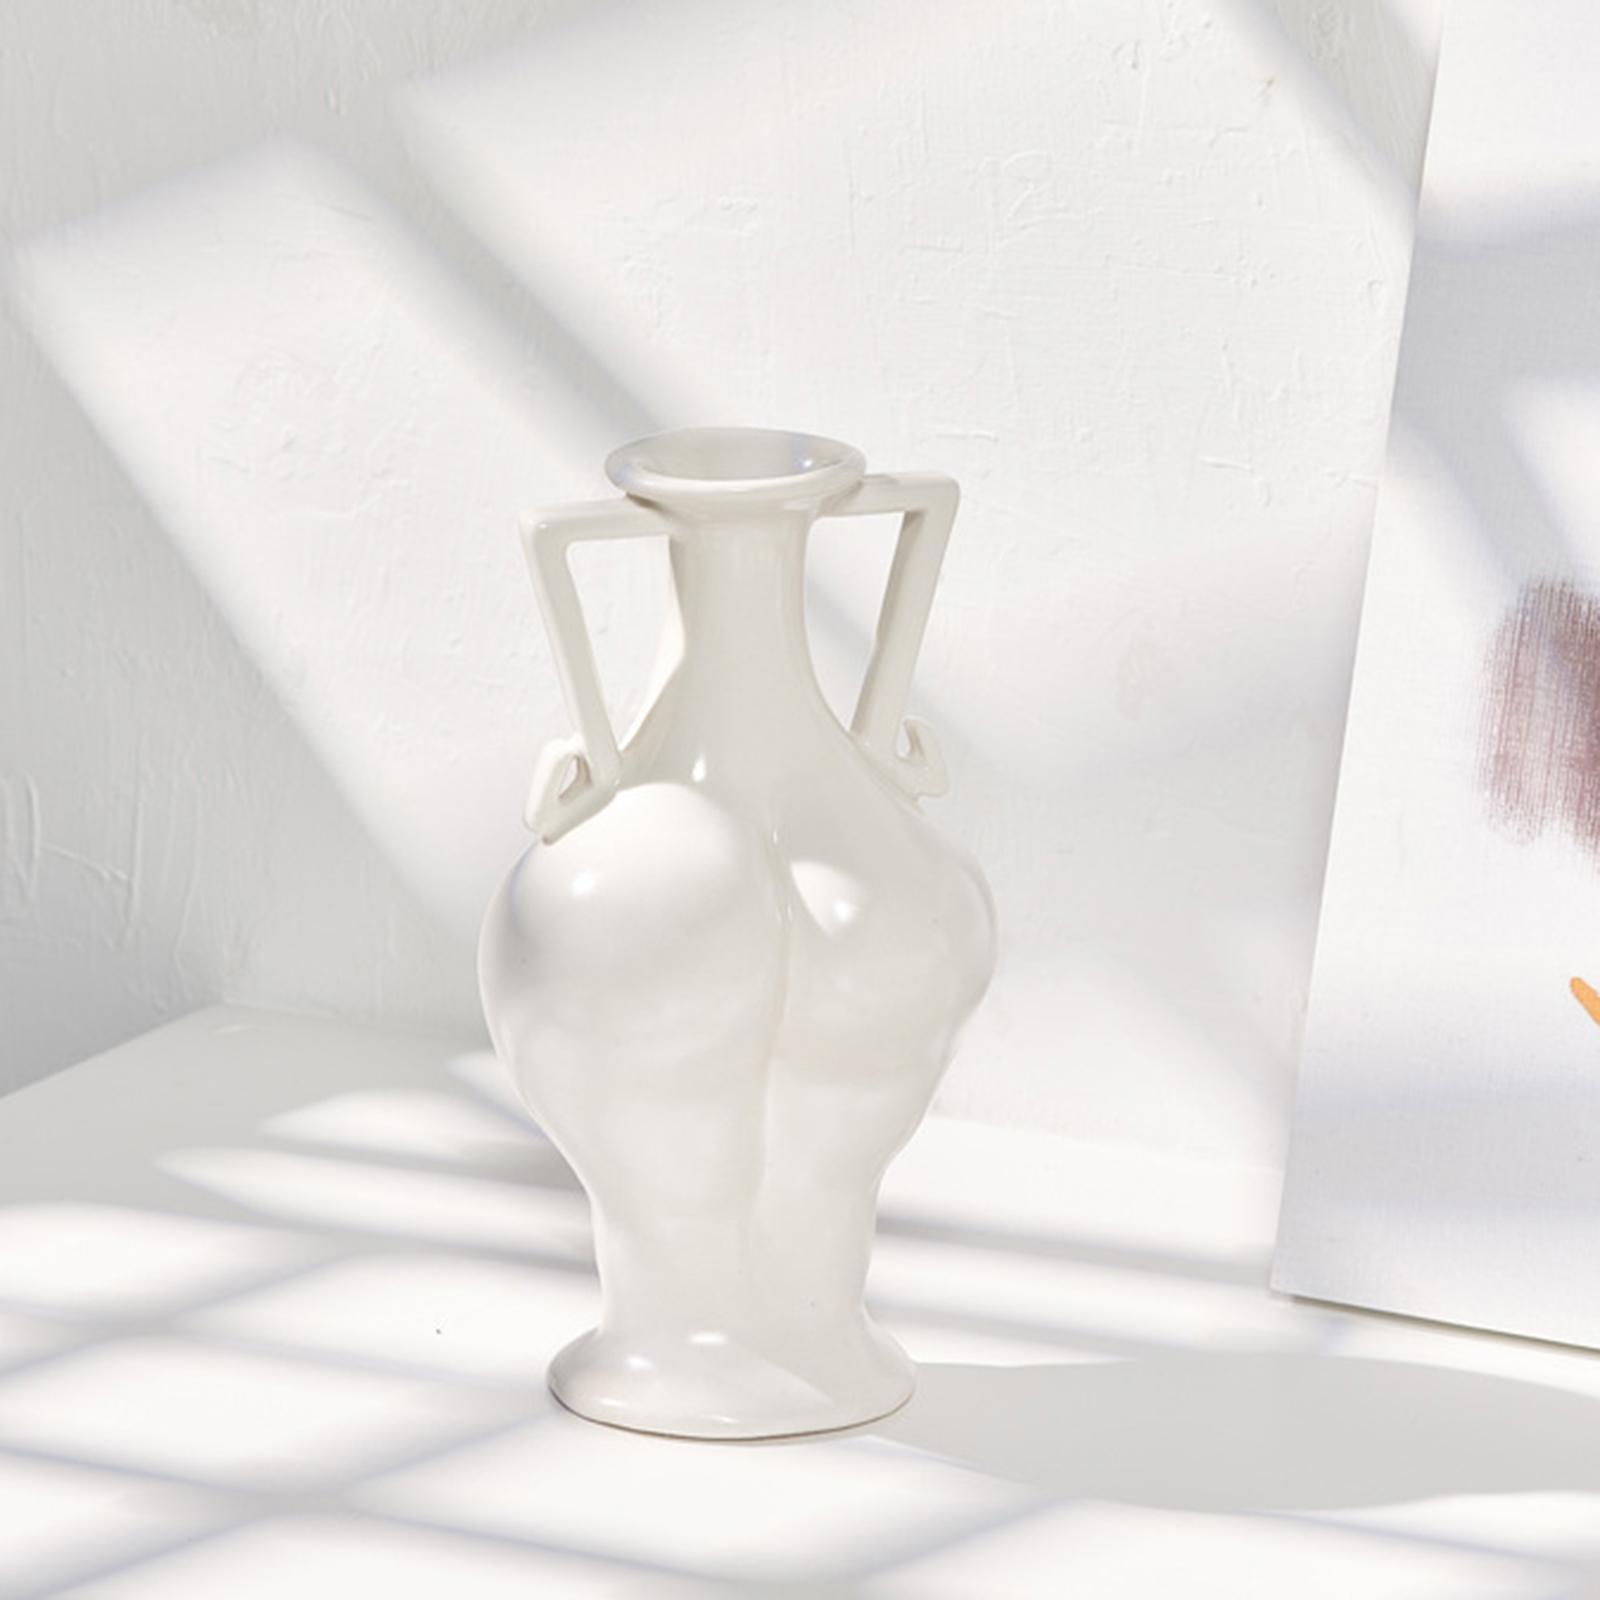 Indexbild 28 - Blumenvase Keramik Blumentöpfe Trockenblumenhalter Pflanzenvasen Wohnkultur